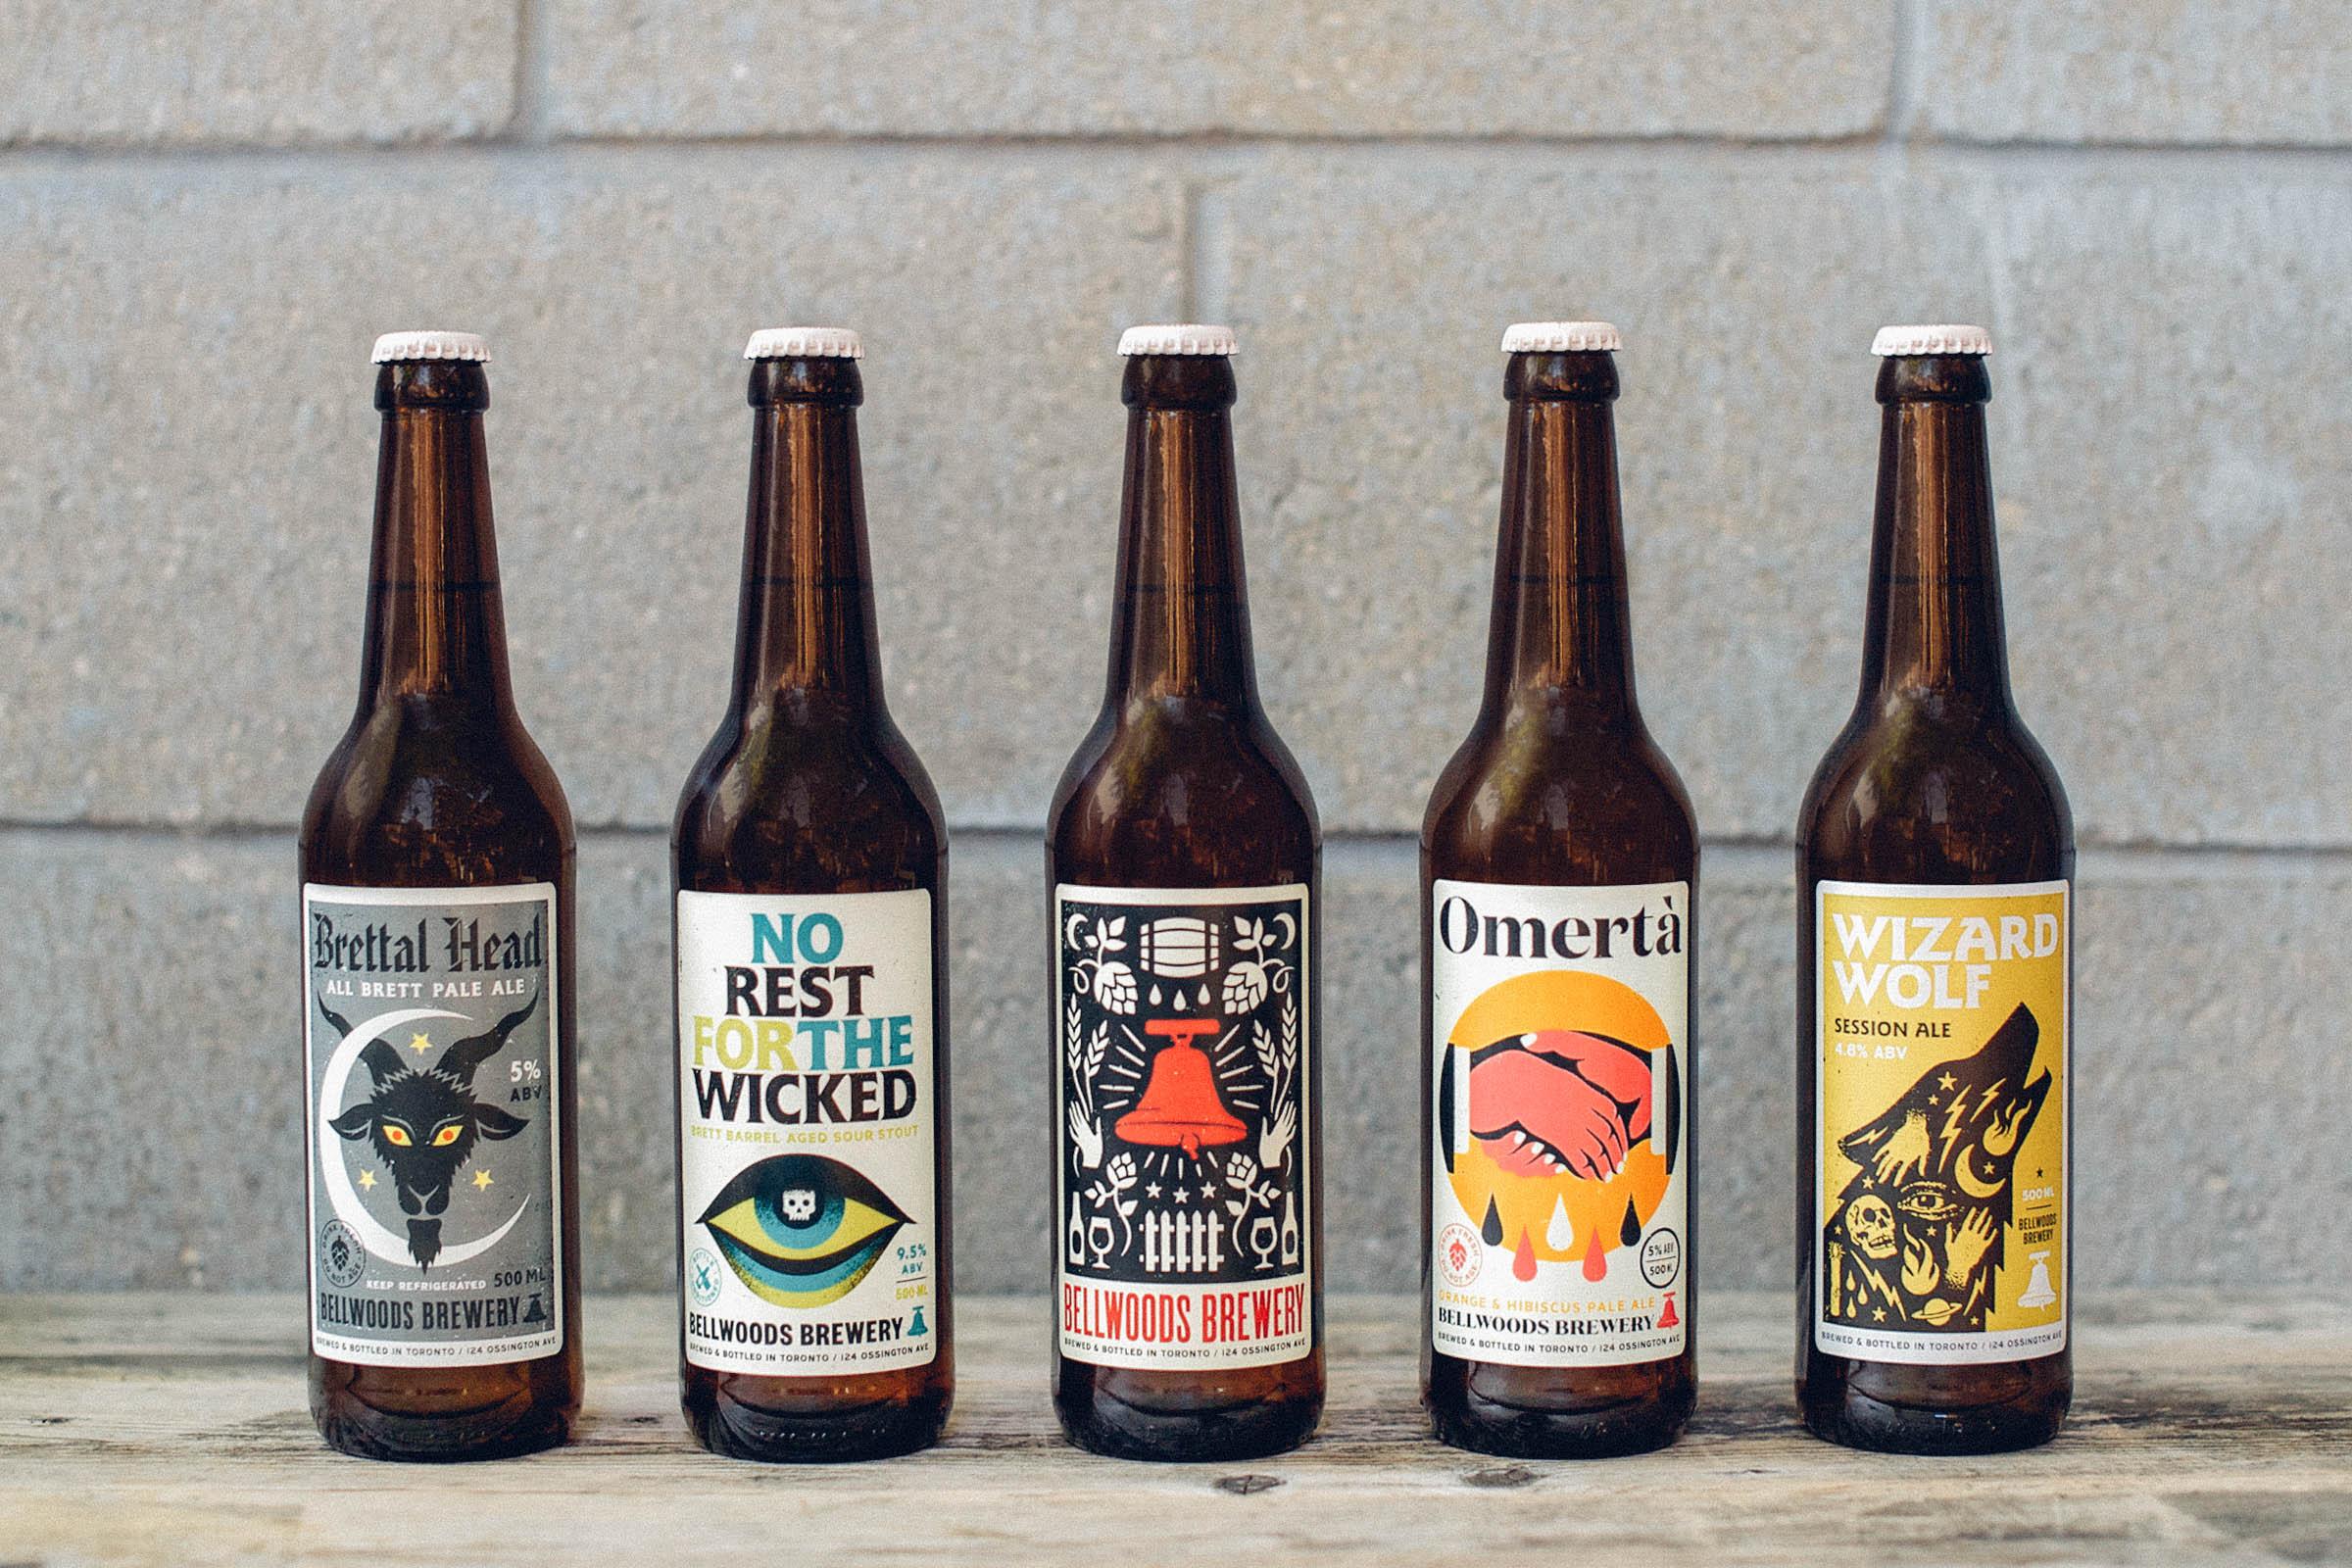 Beer & Branding: Bellwoods Brewery